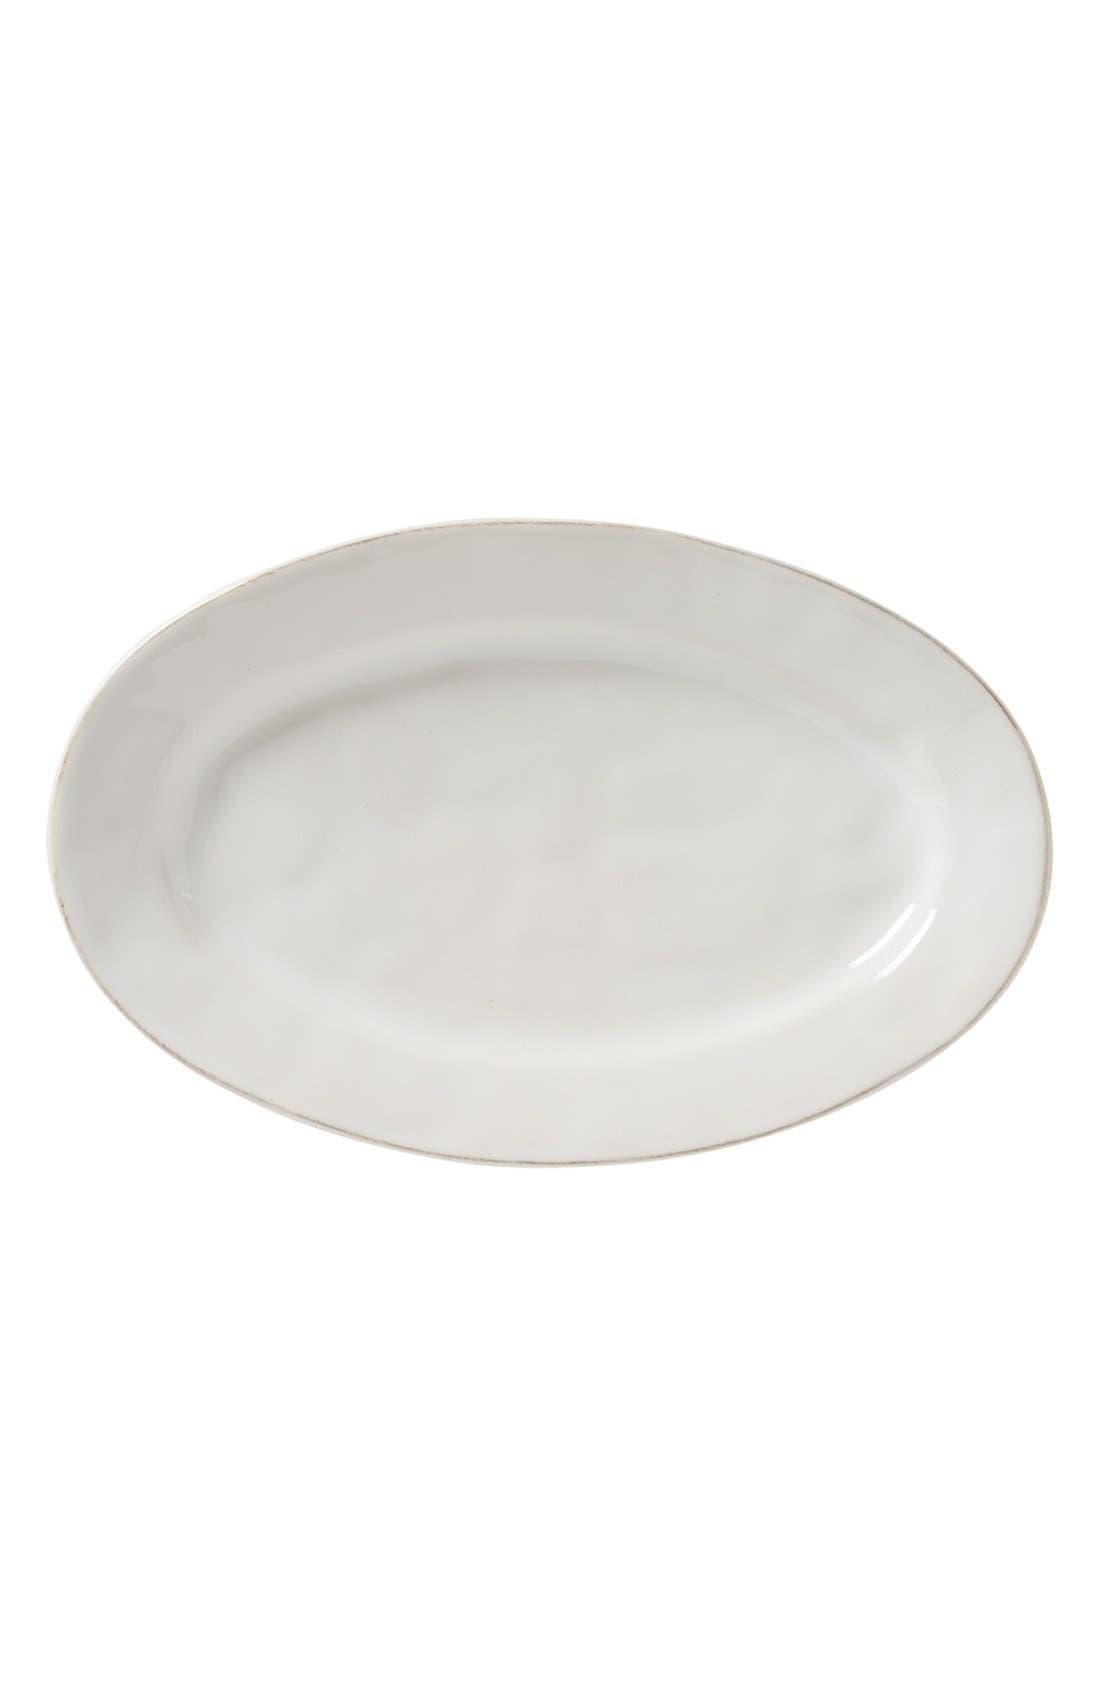 'Puro' Oval Platter,                         Main,                         color, 100